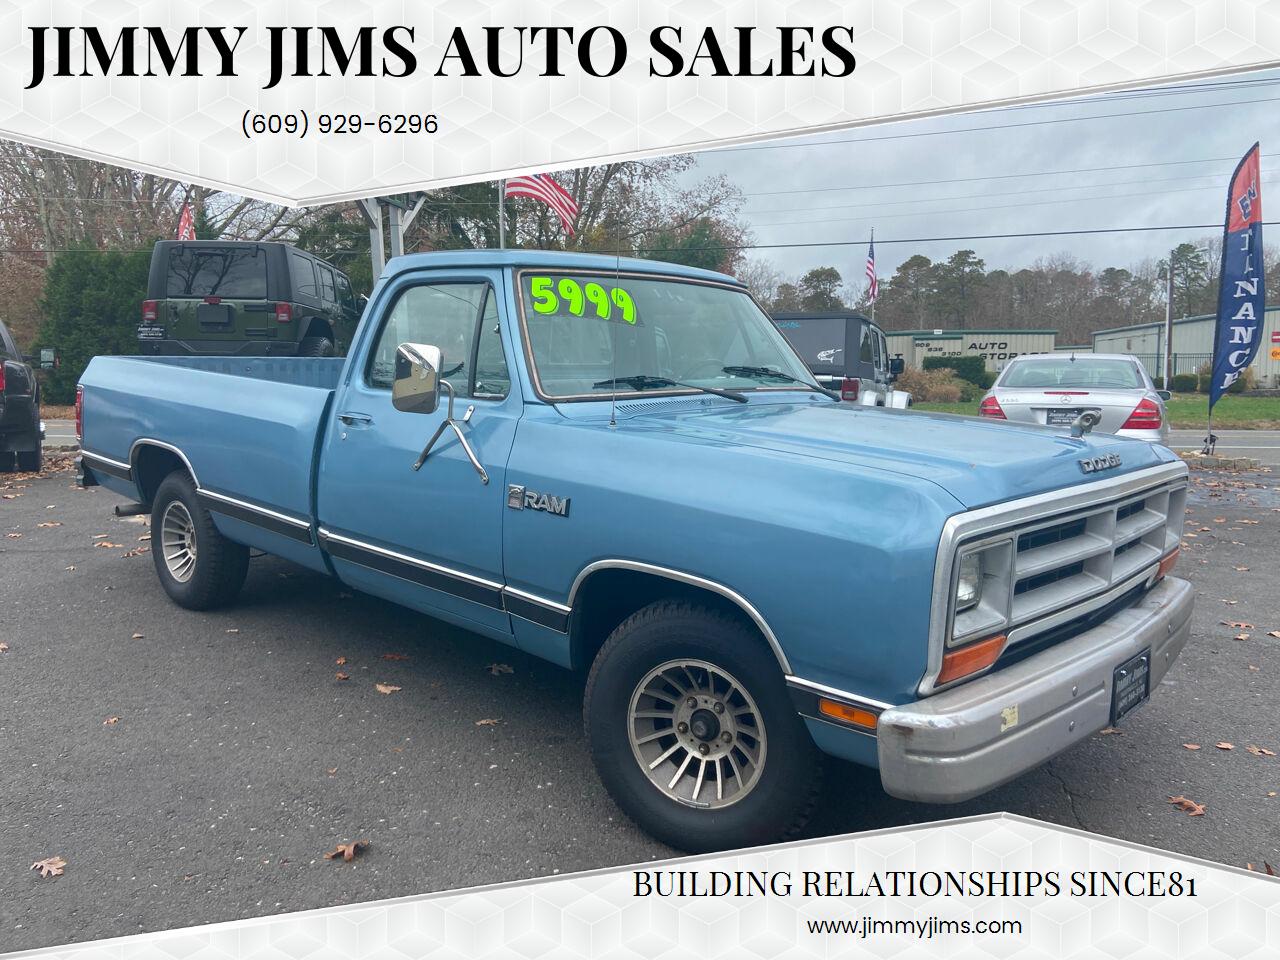 Used 1988 Dodge Ram For Sale Carsforsale Com